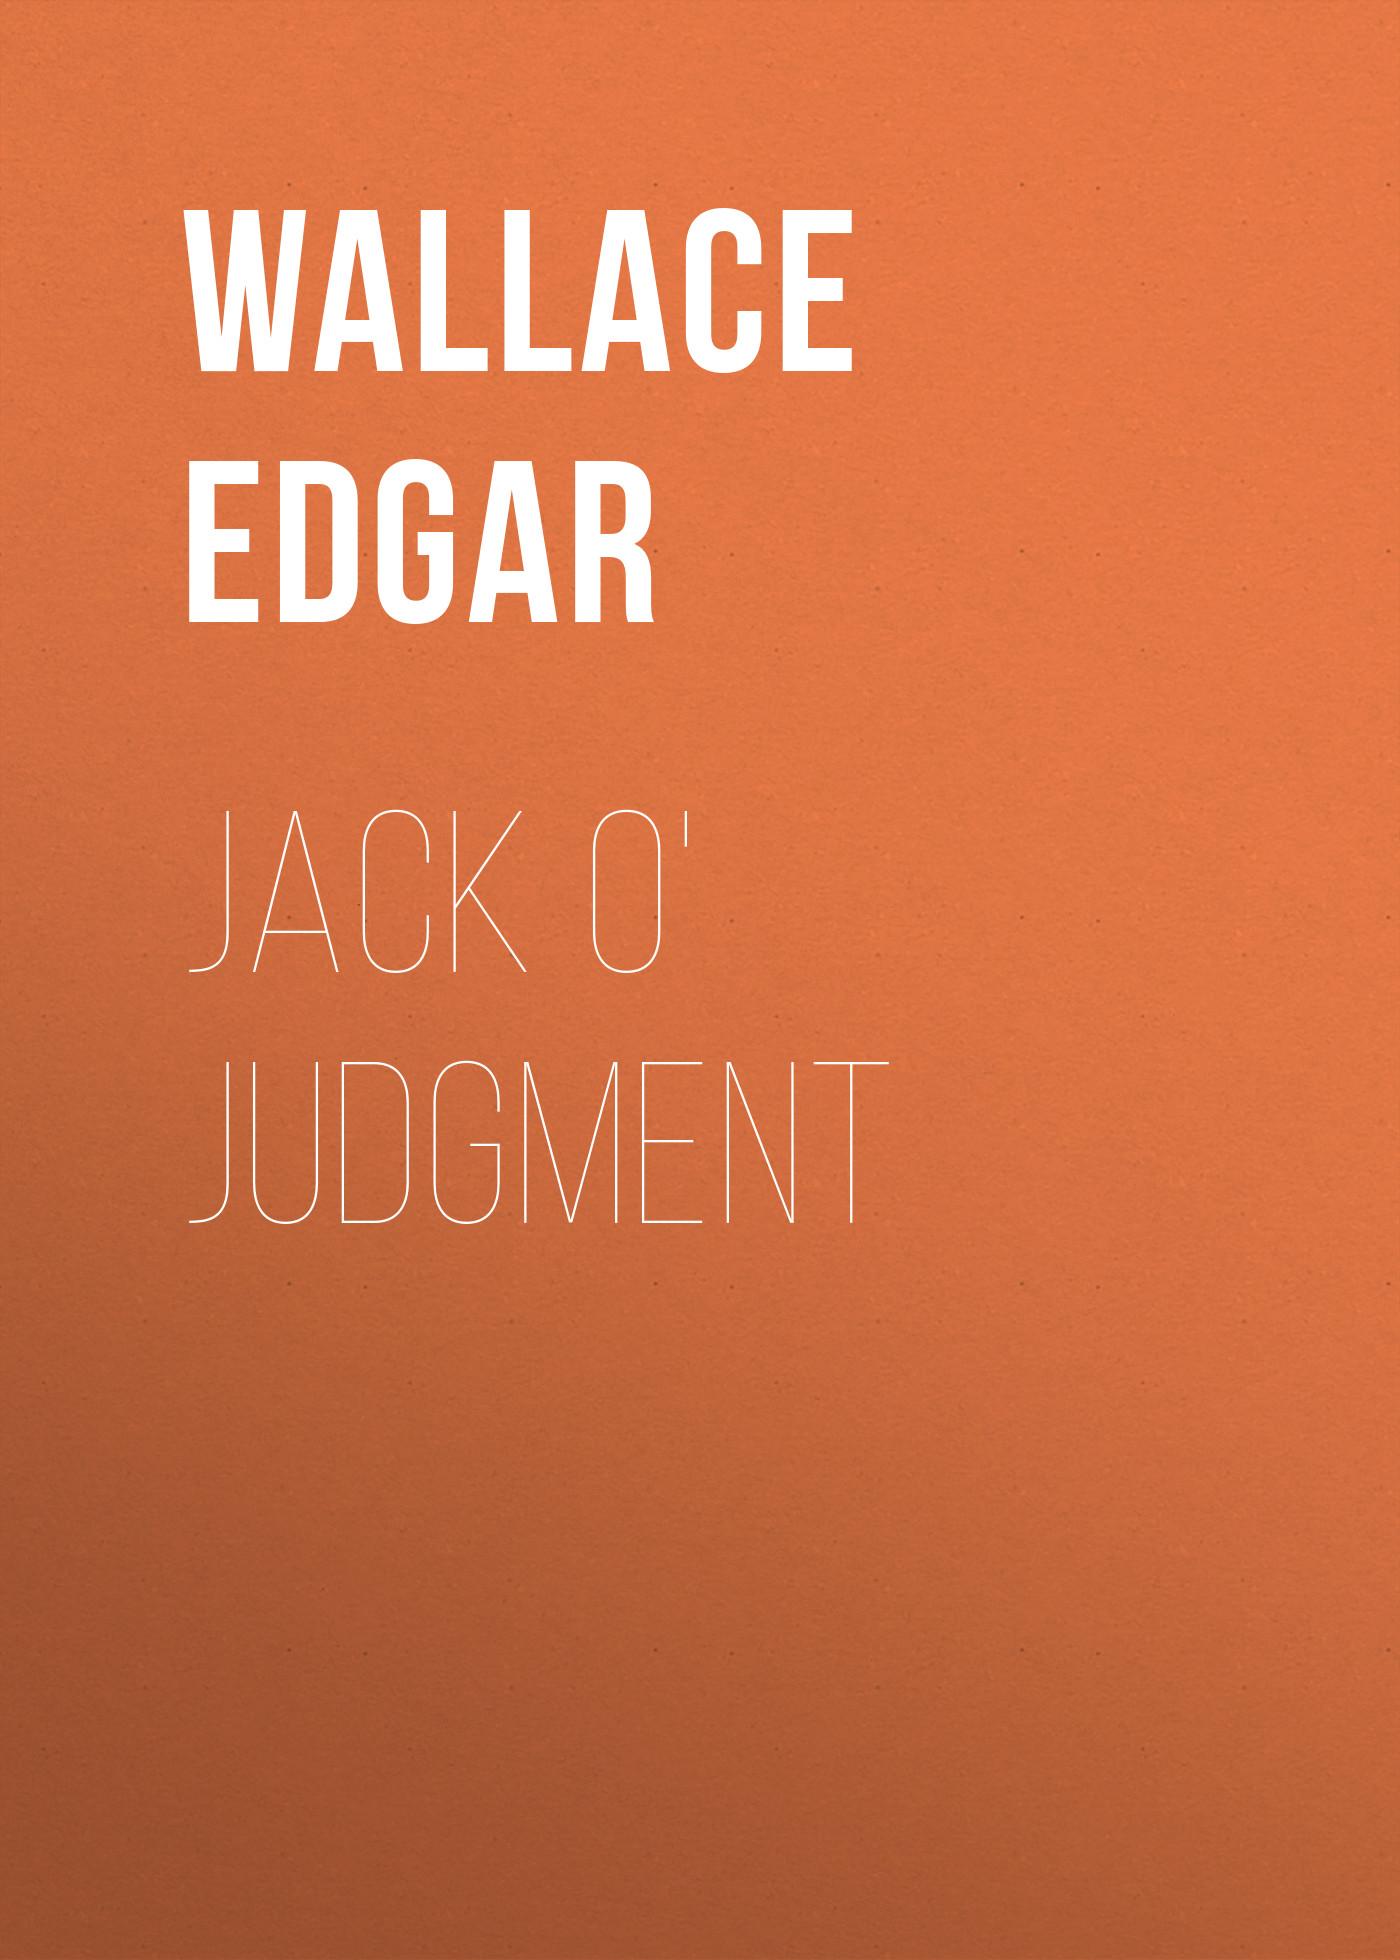 Wallace Edgar Jack O' Judgment critical judgment